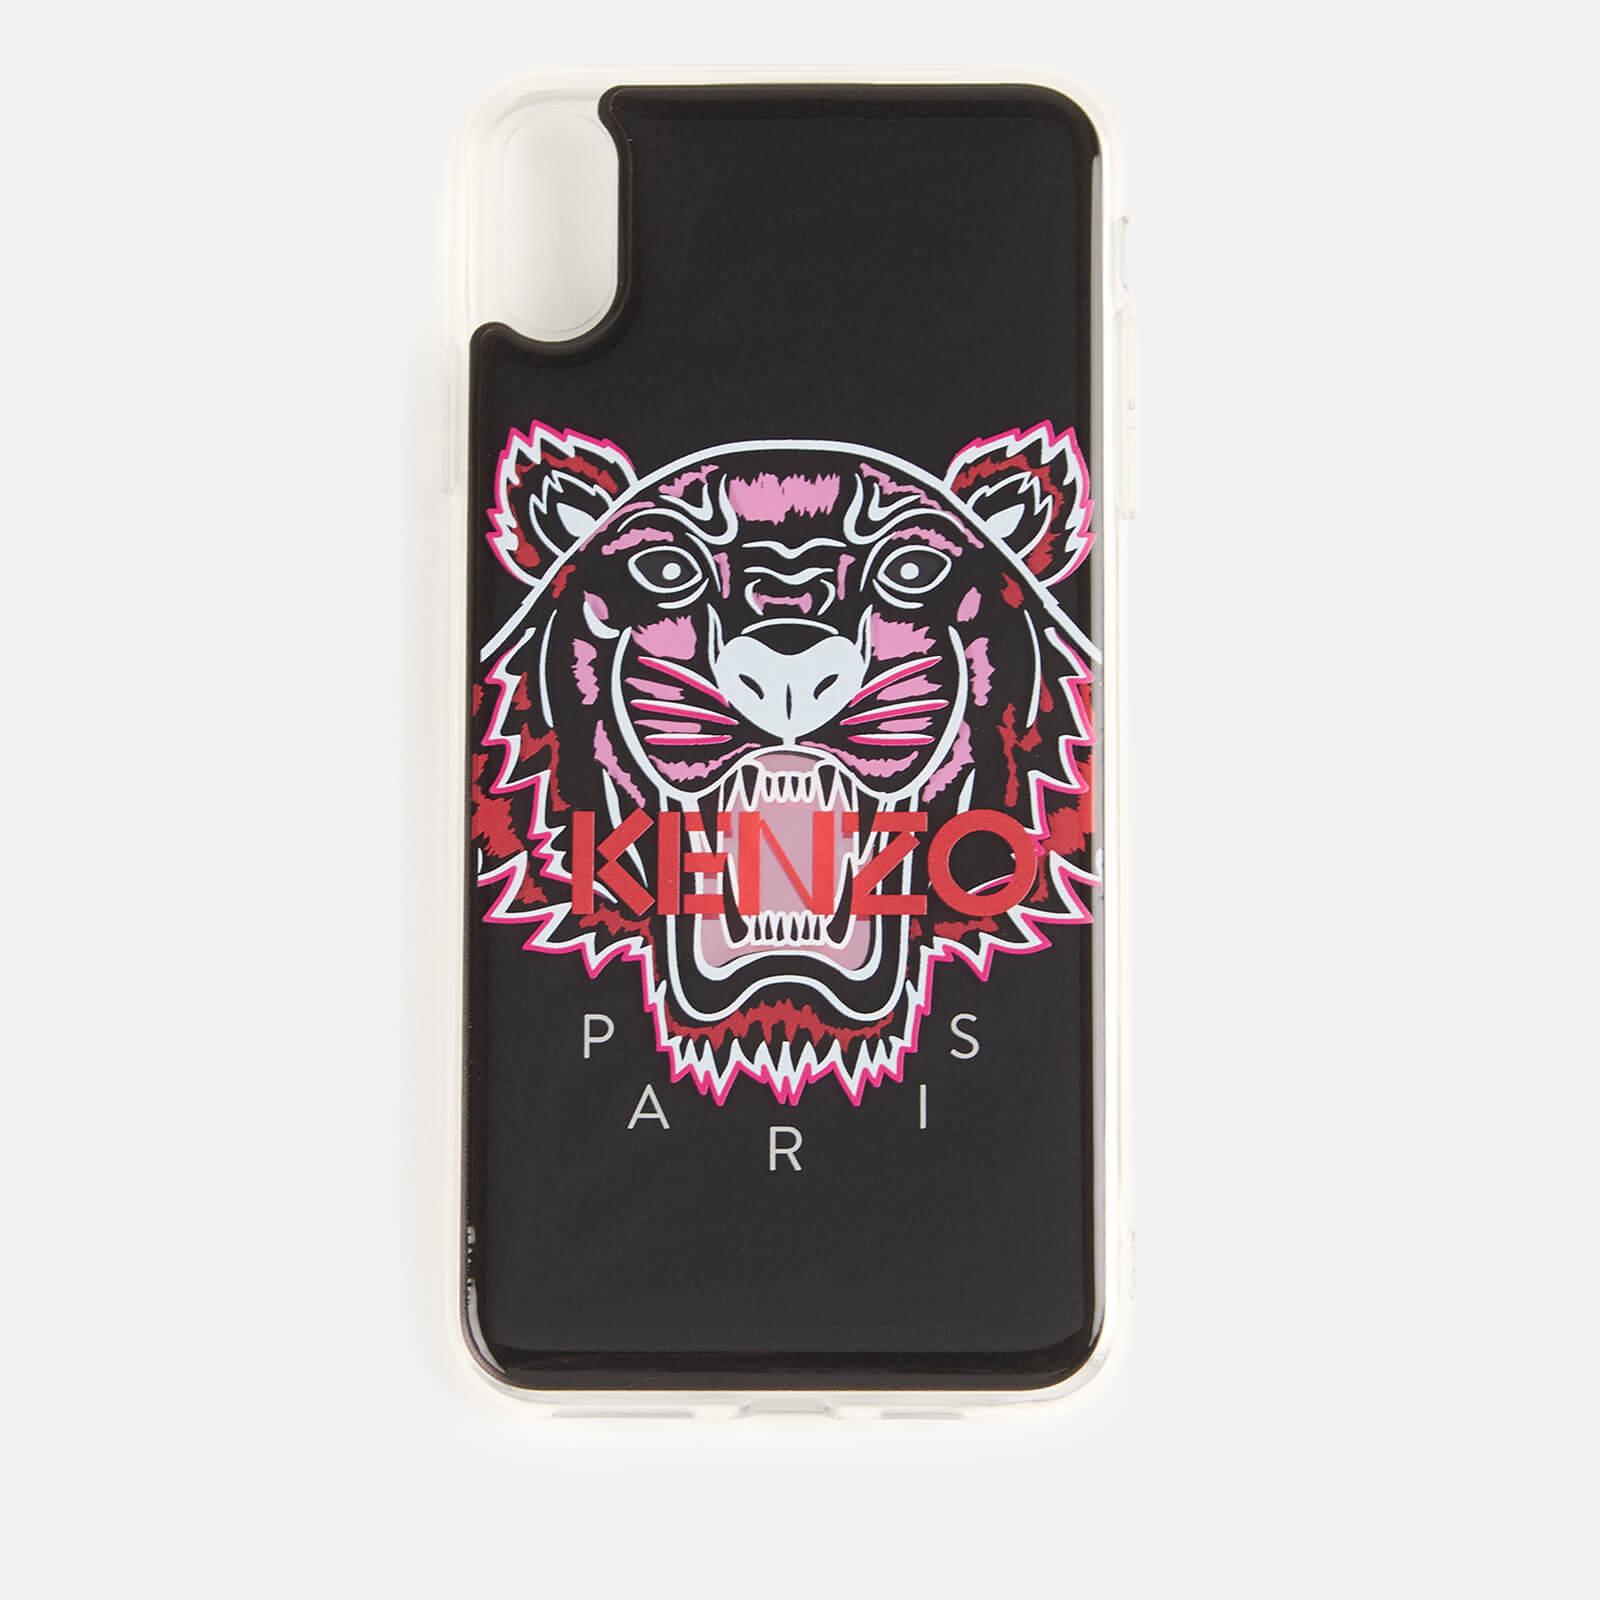 2b16c75c84 KENZO iPhone X Max Case - Black/Pink